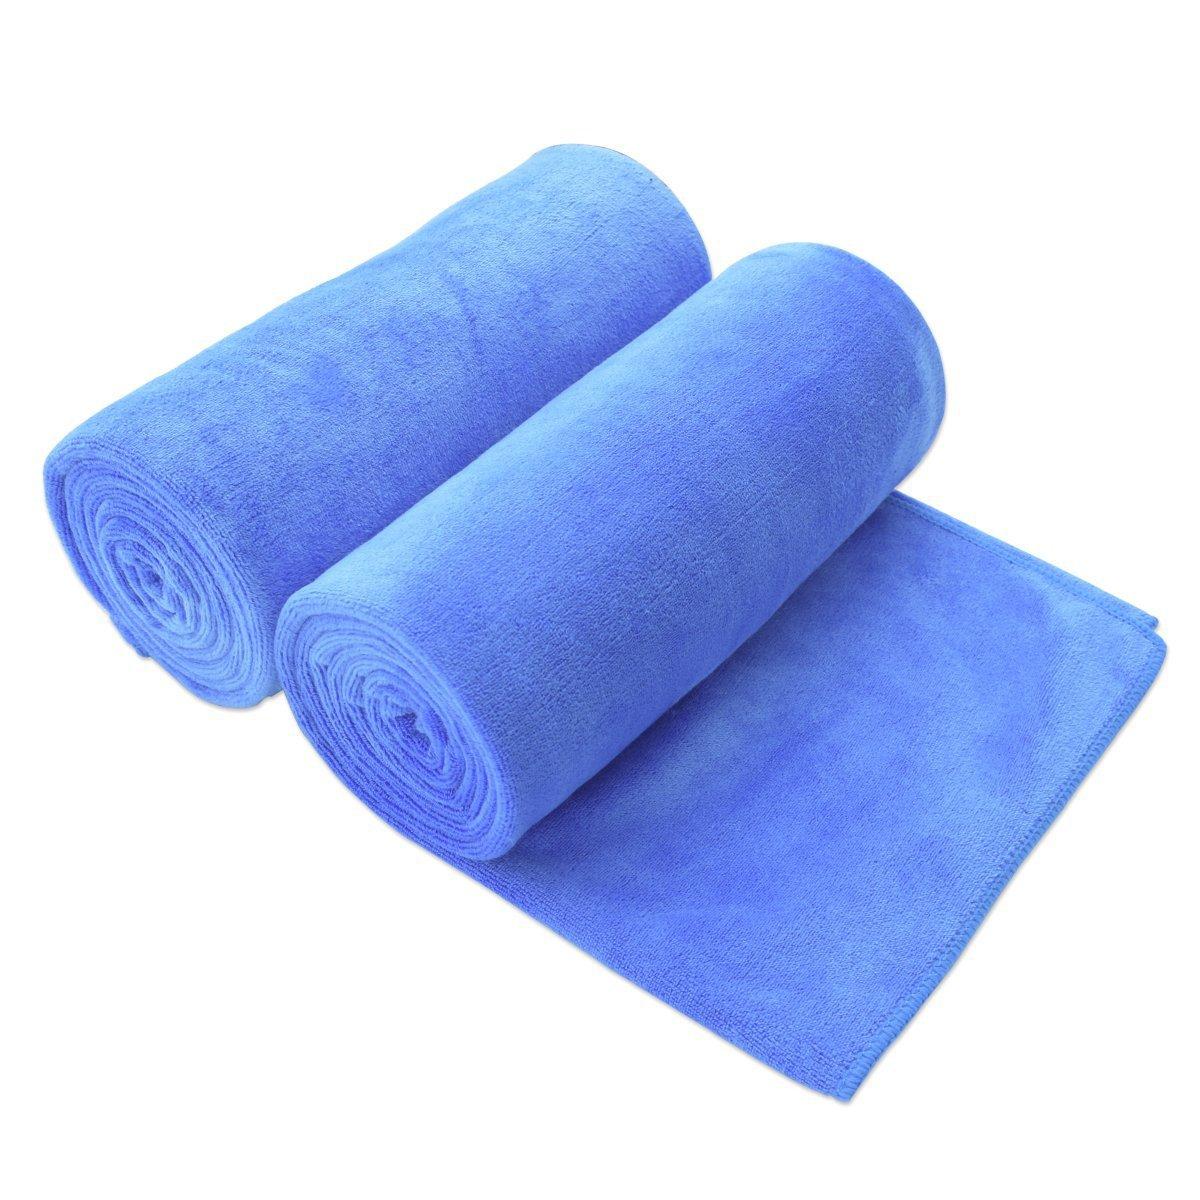 Jml Bath Towel, Microfiber 2 Pack Towel Sets (30